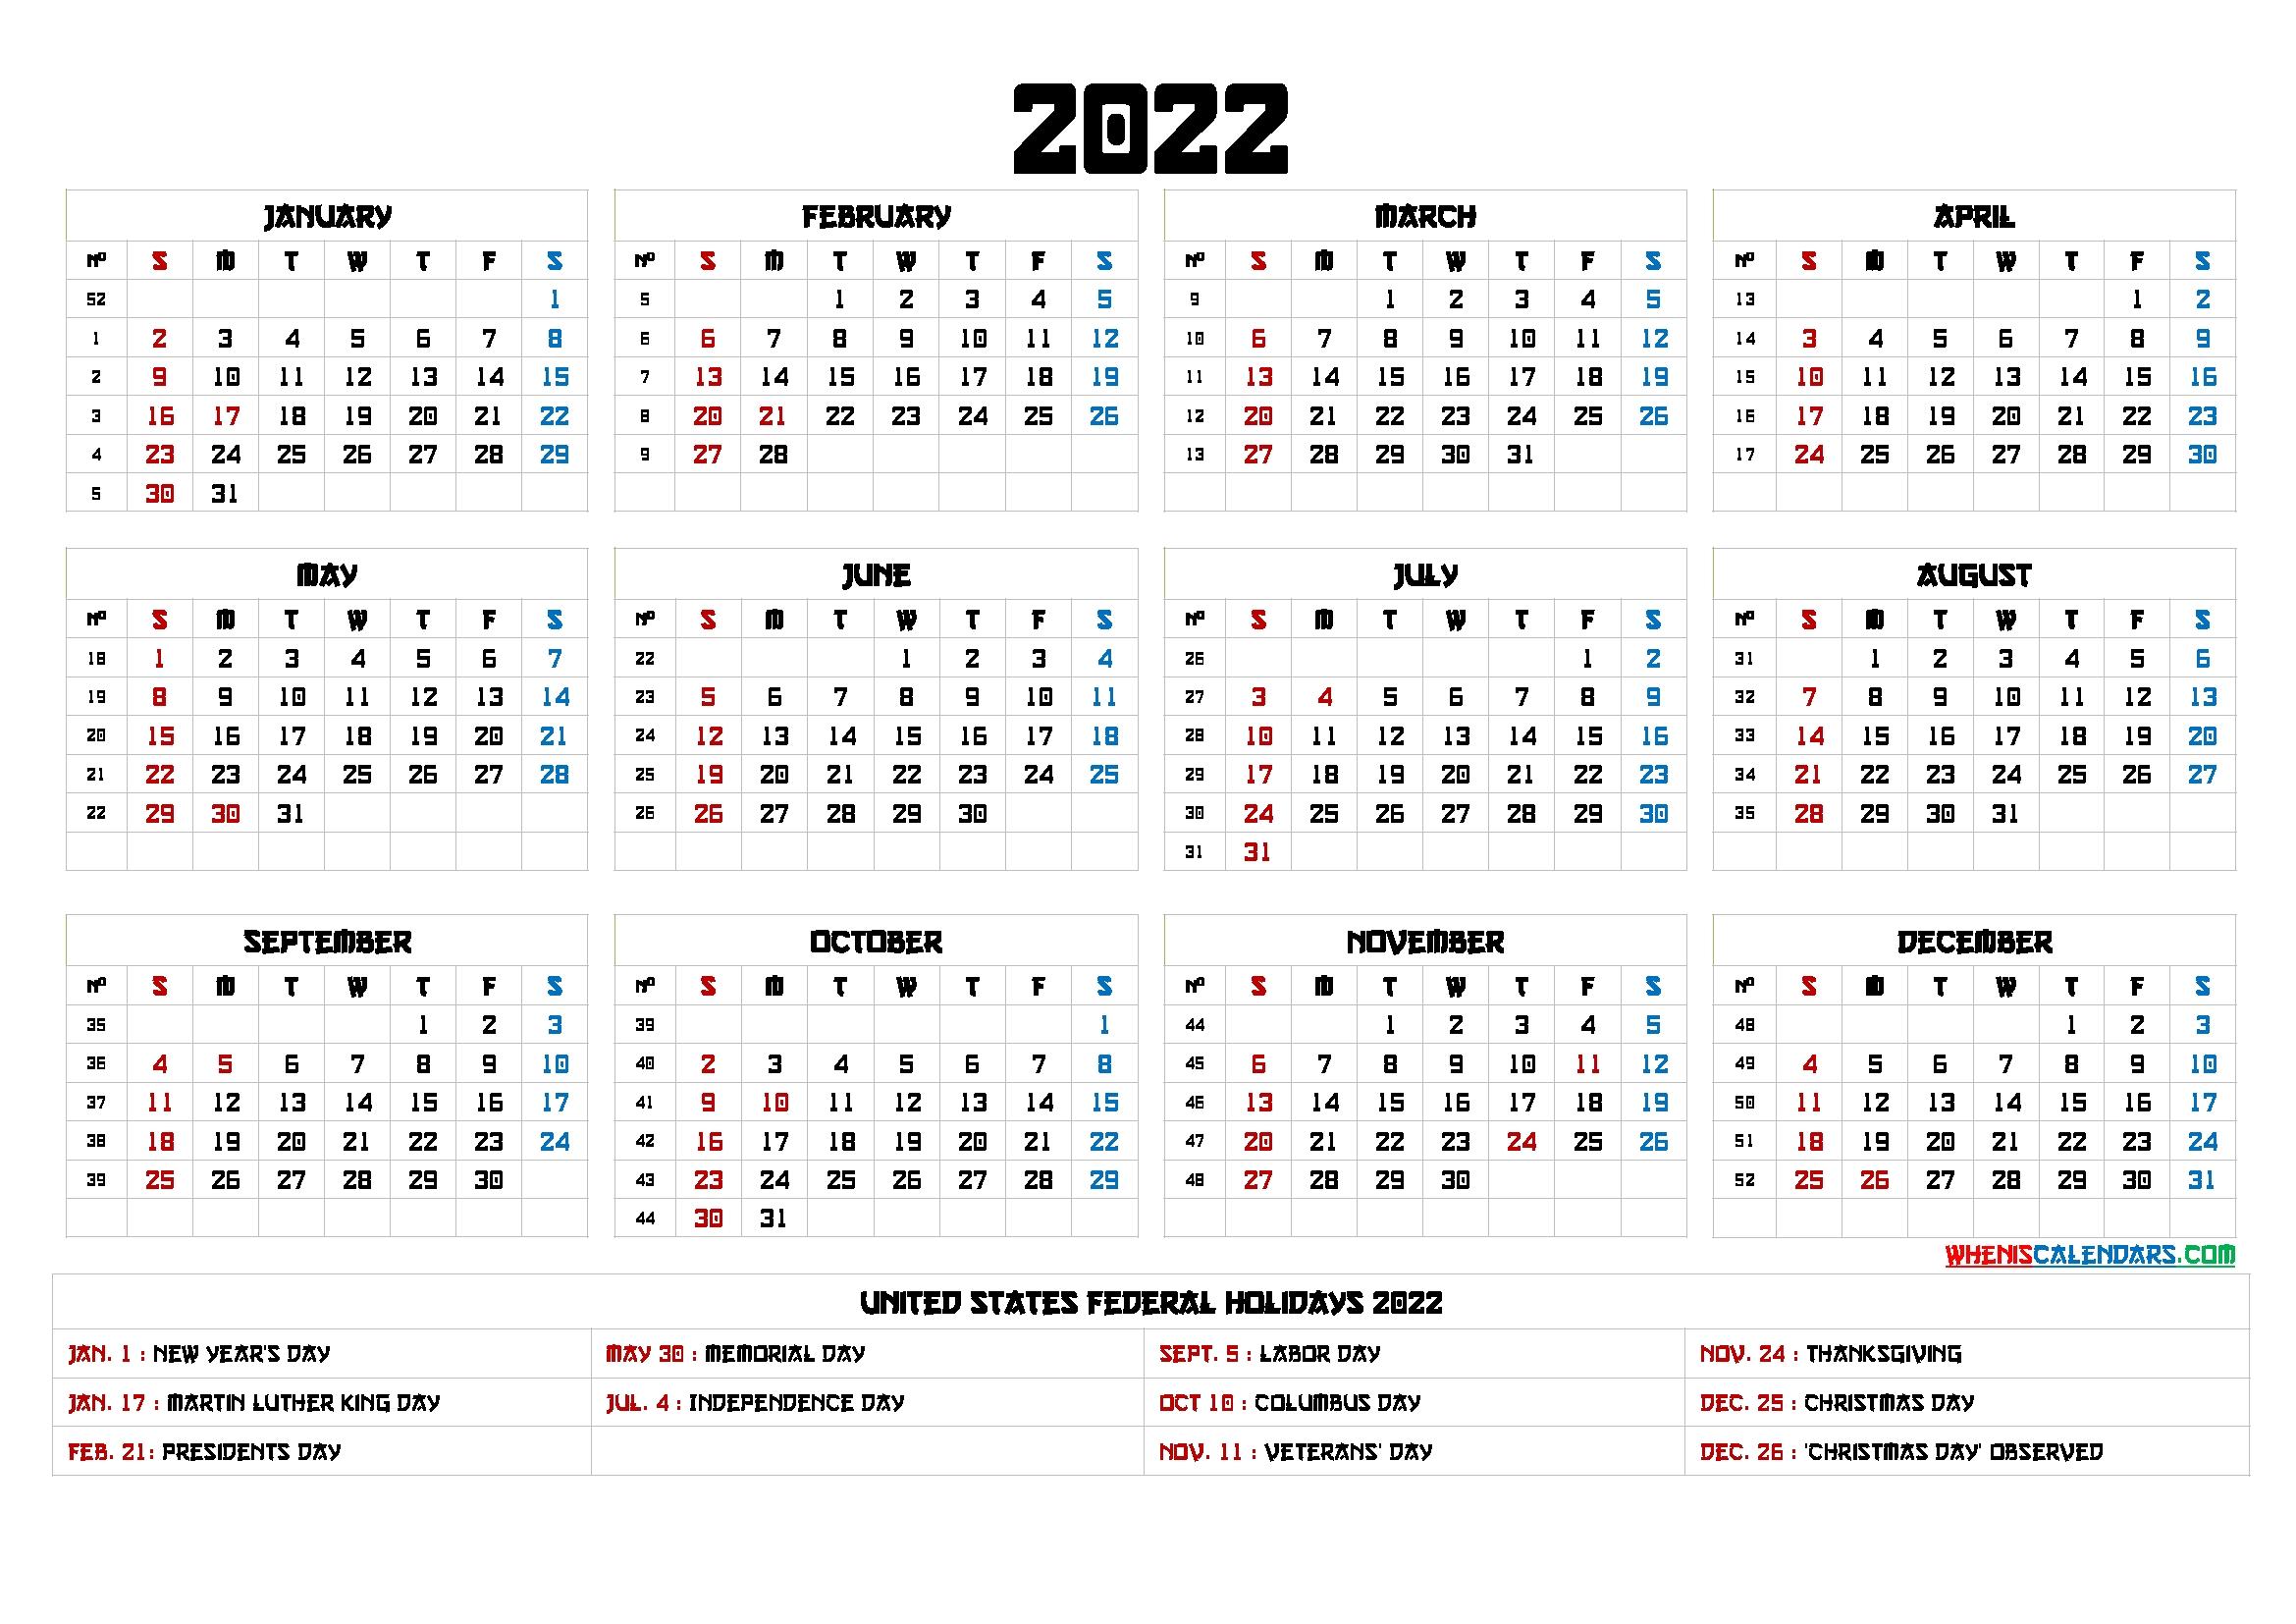 20 2022 calendar uk free download printable calendar templates::2022 Calendar Canada with Holidays Printable